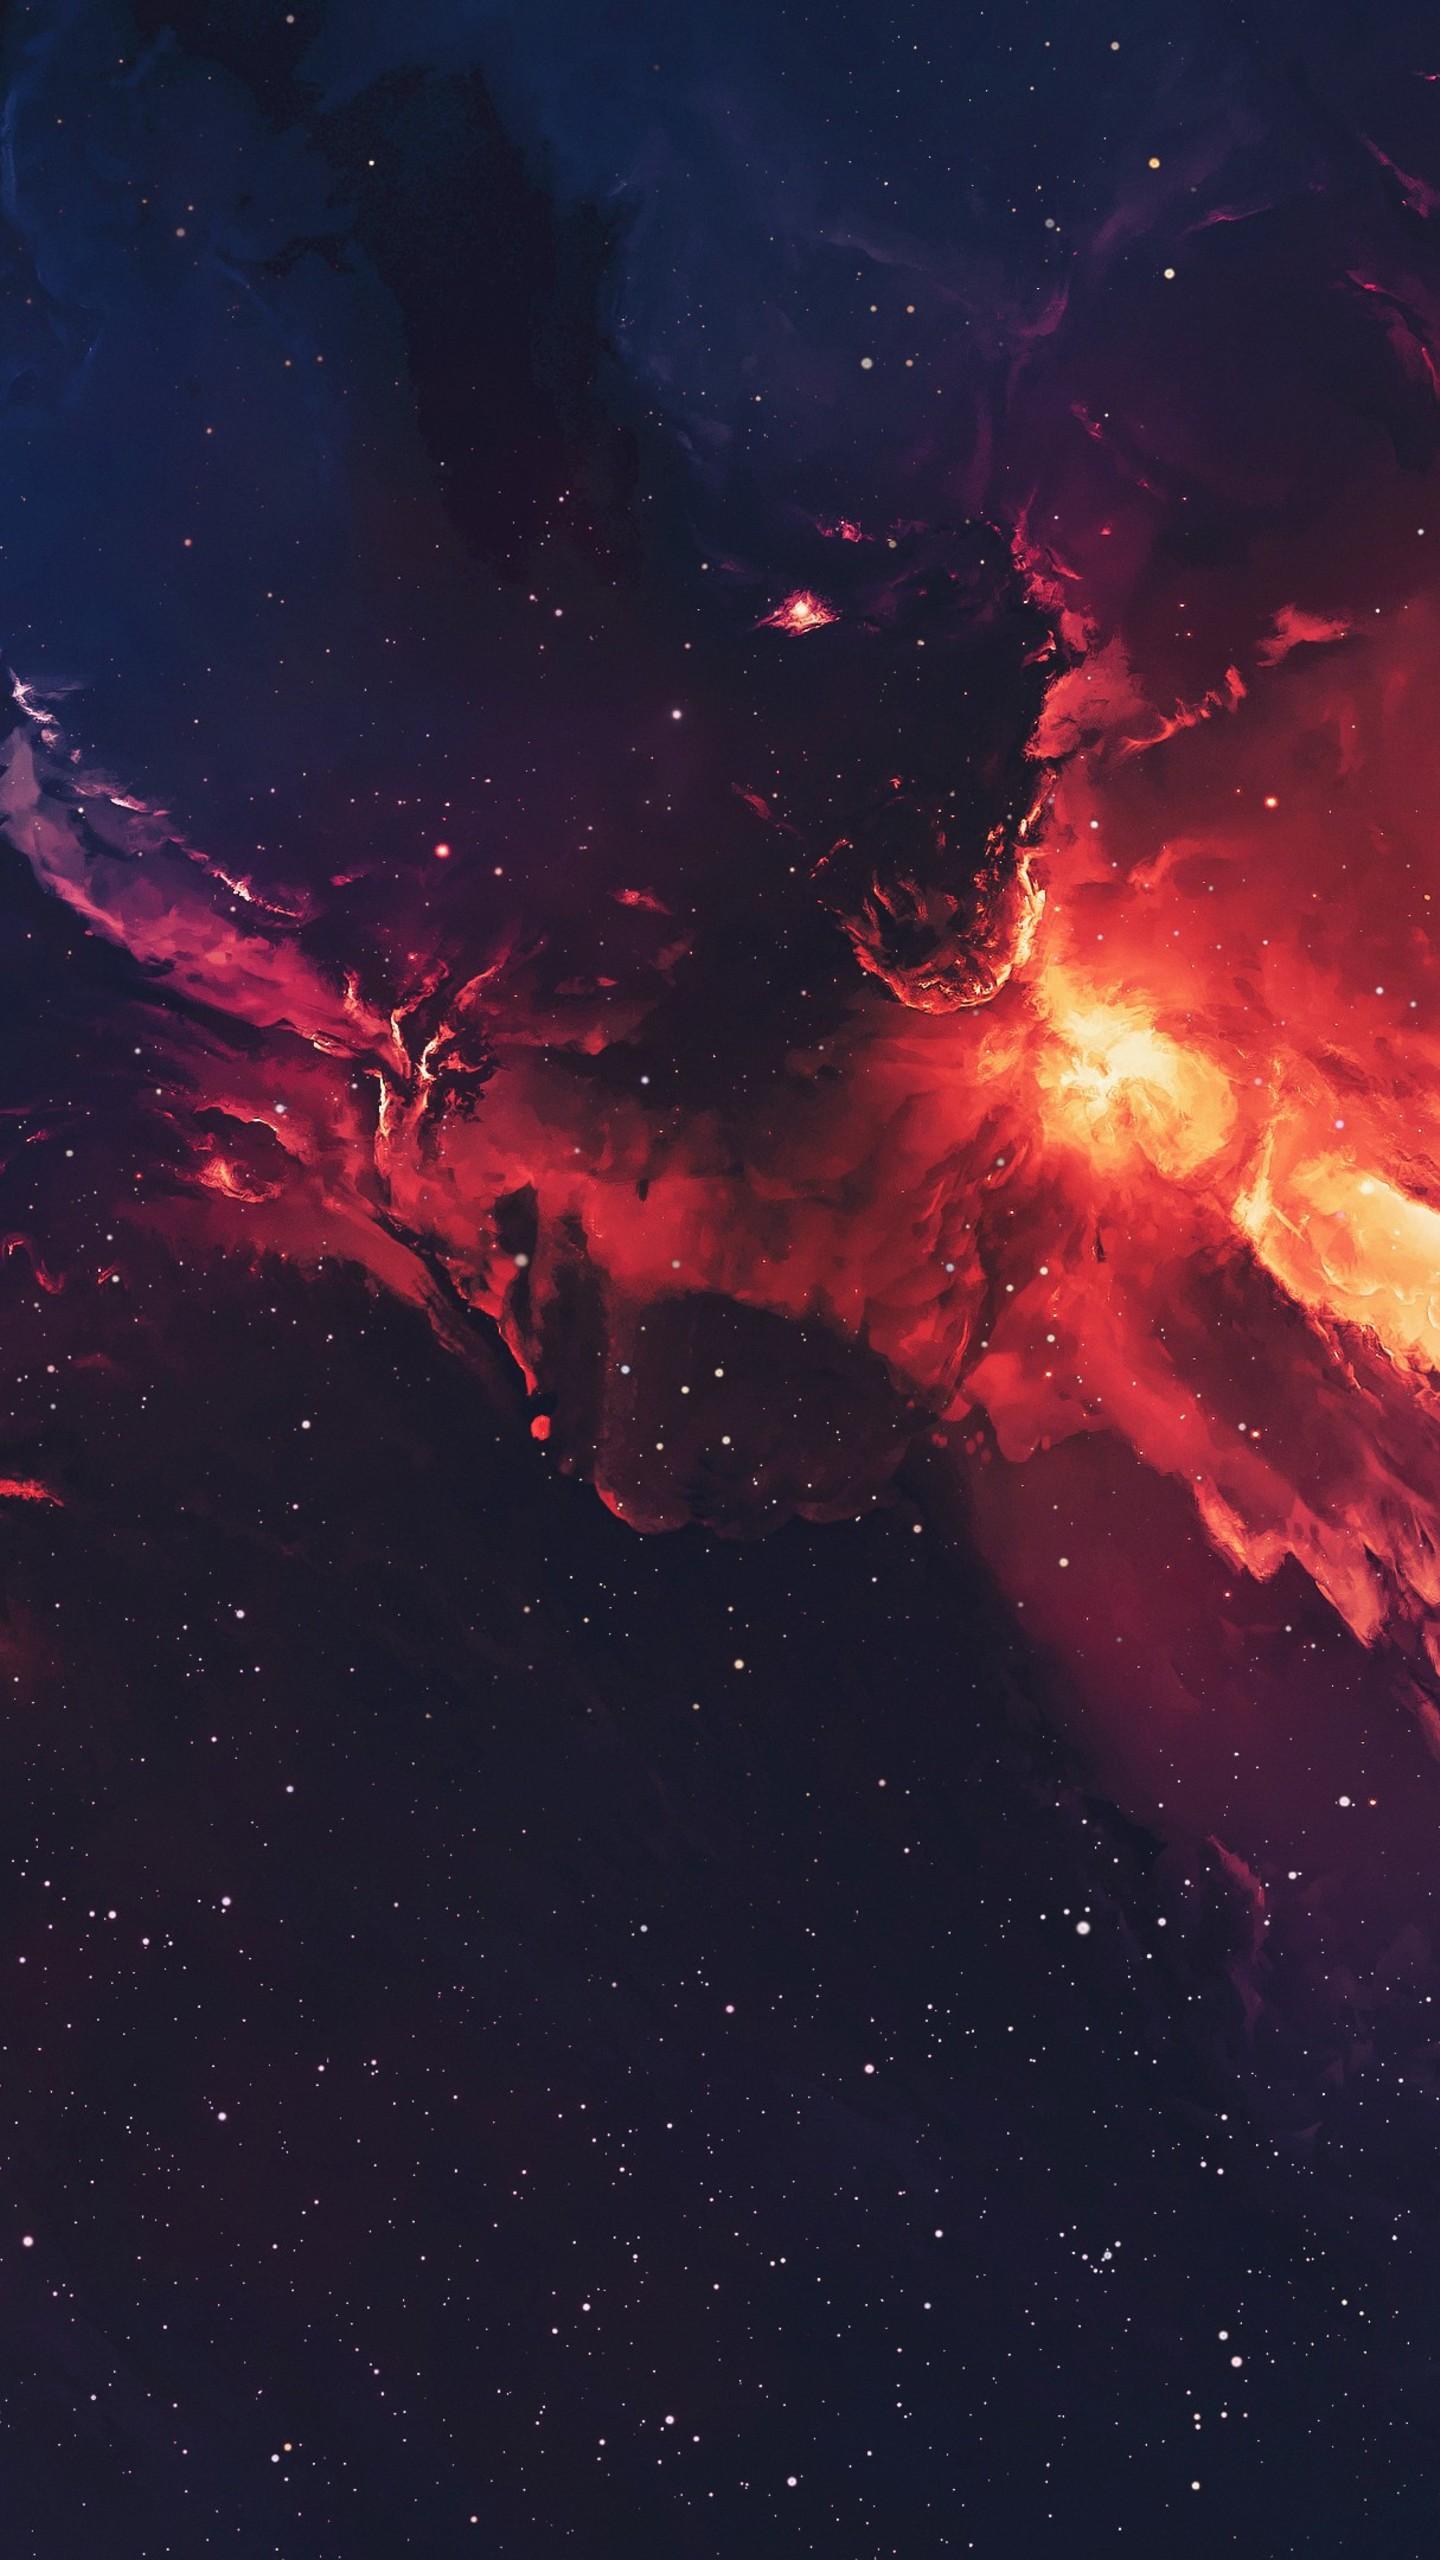 S7 Wallpaper 4k 4k Galaxy Wallpaper Iphone 102928 Hd Wallpaper Backgrounds Download